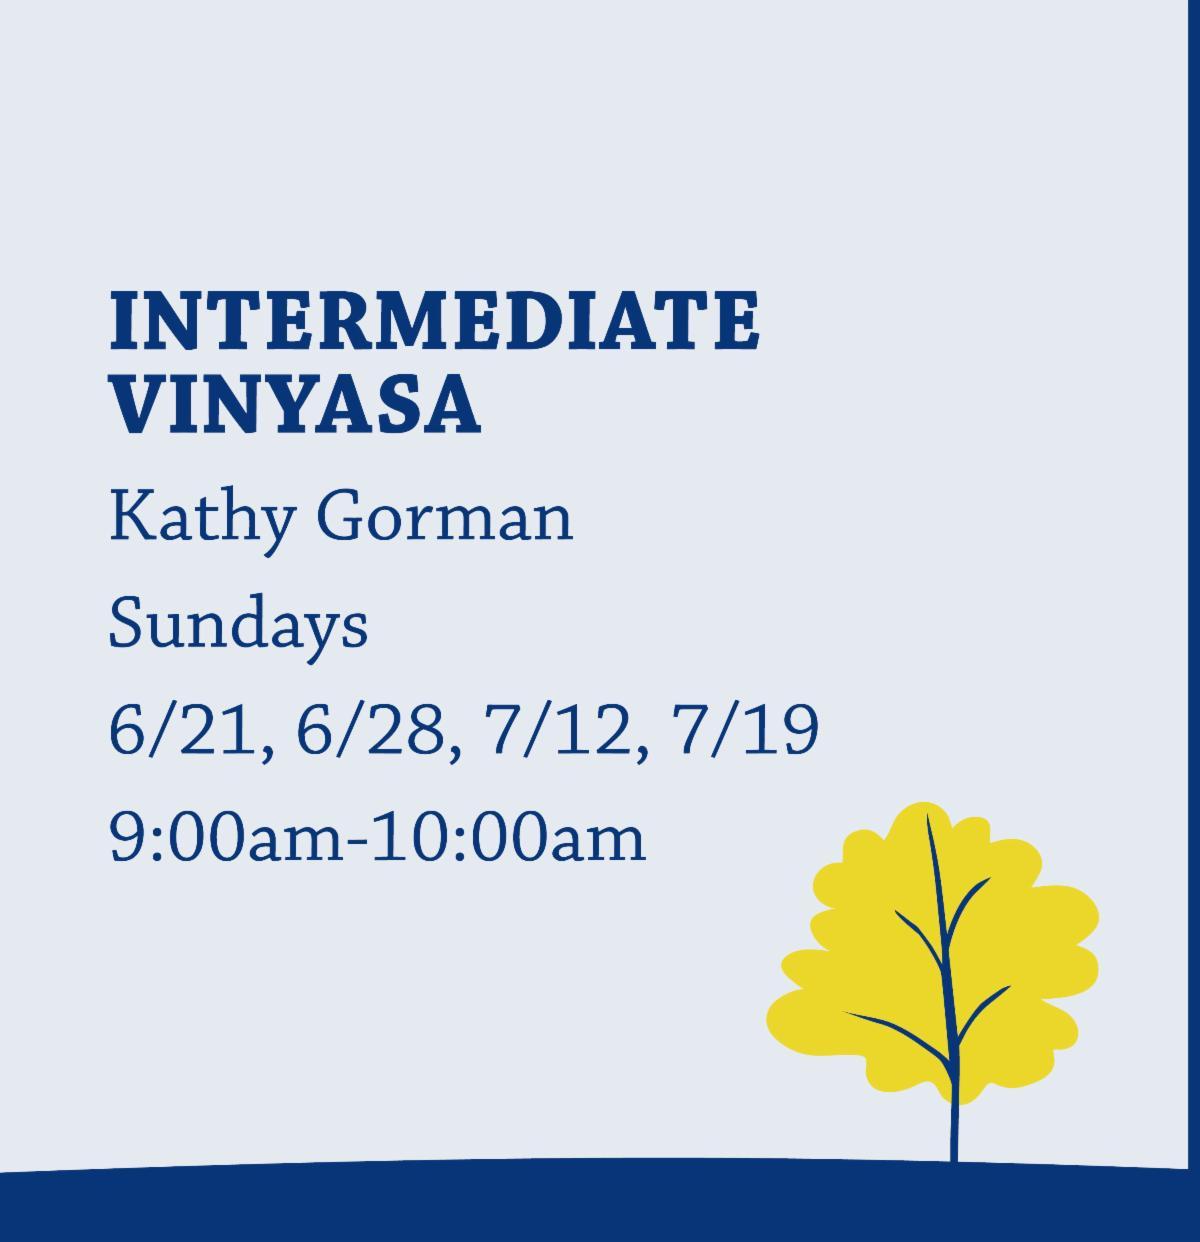 Intermediate Vinyasa with Kathy Gorman on Sundays from 9:00am-10:00am